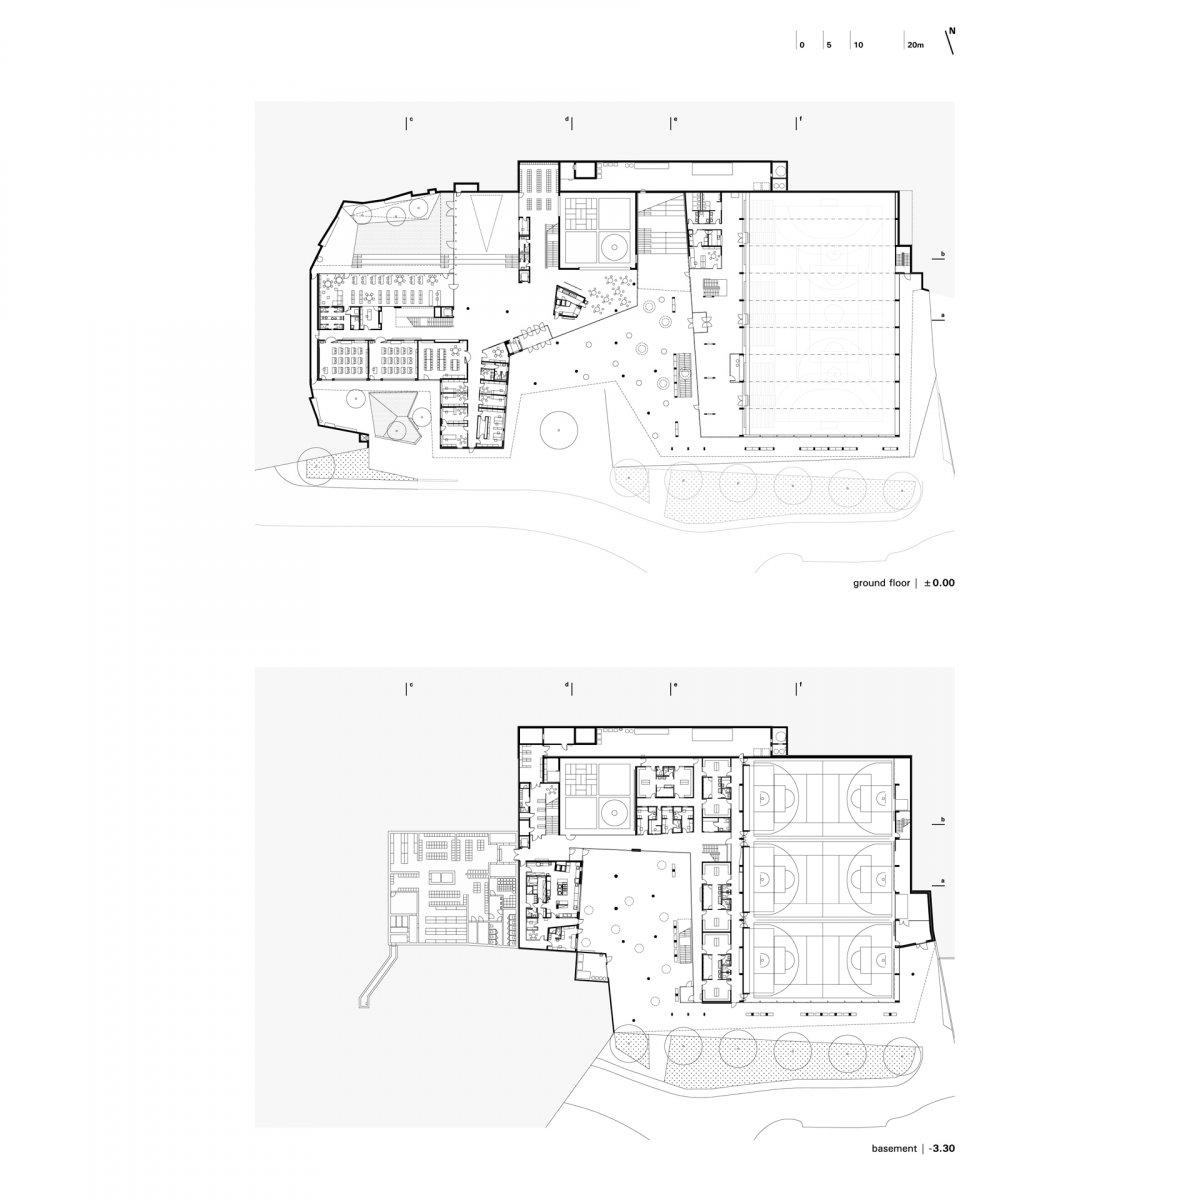 ground / basement floor plan